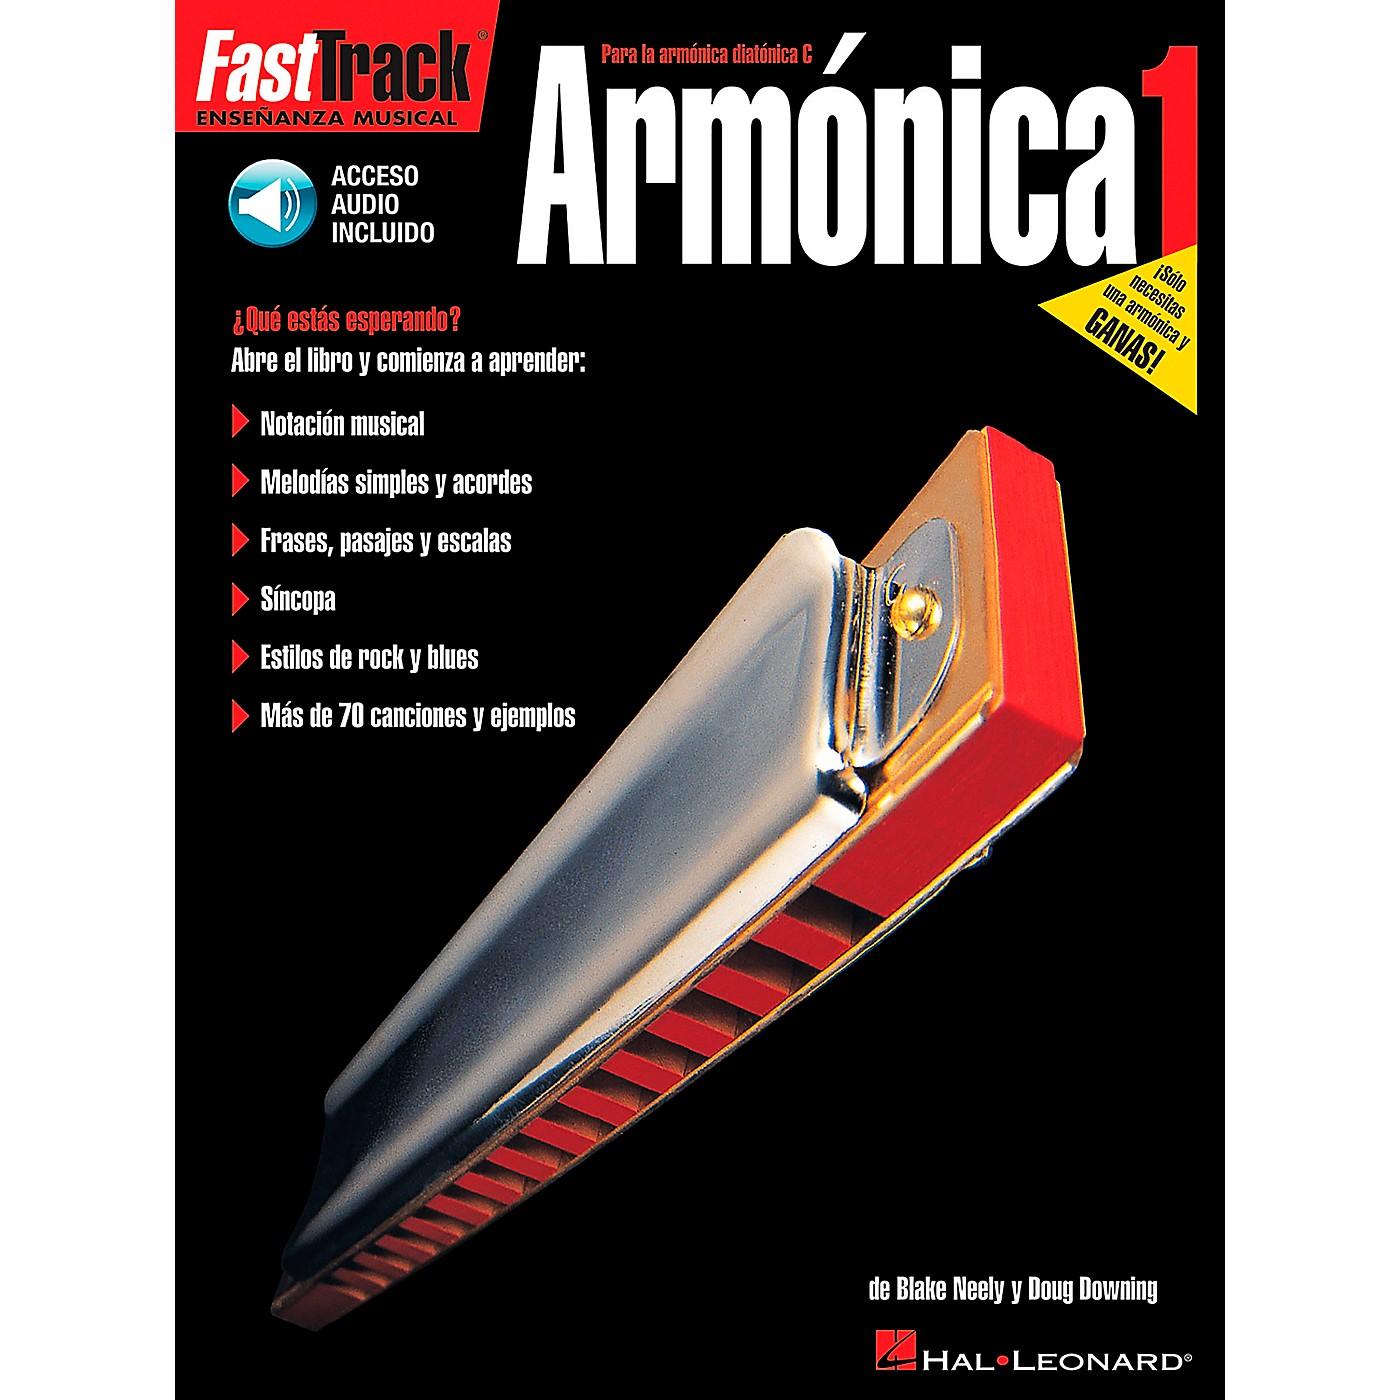 Hal Leonard FastTrack Harmonica Method Book 1 Book/CD - Spanish Edition thumbnail